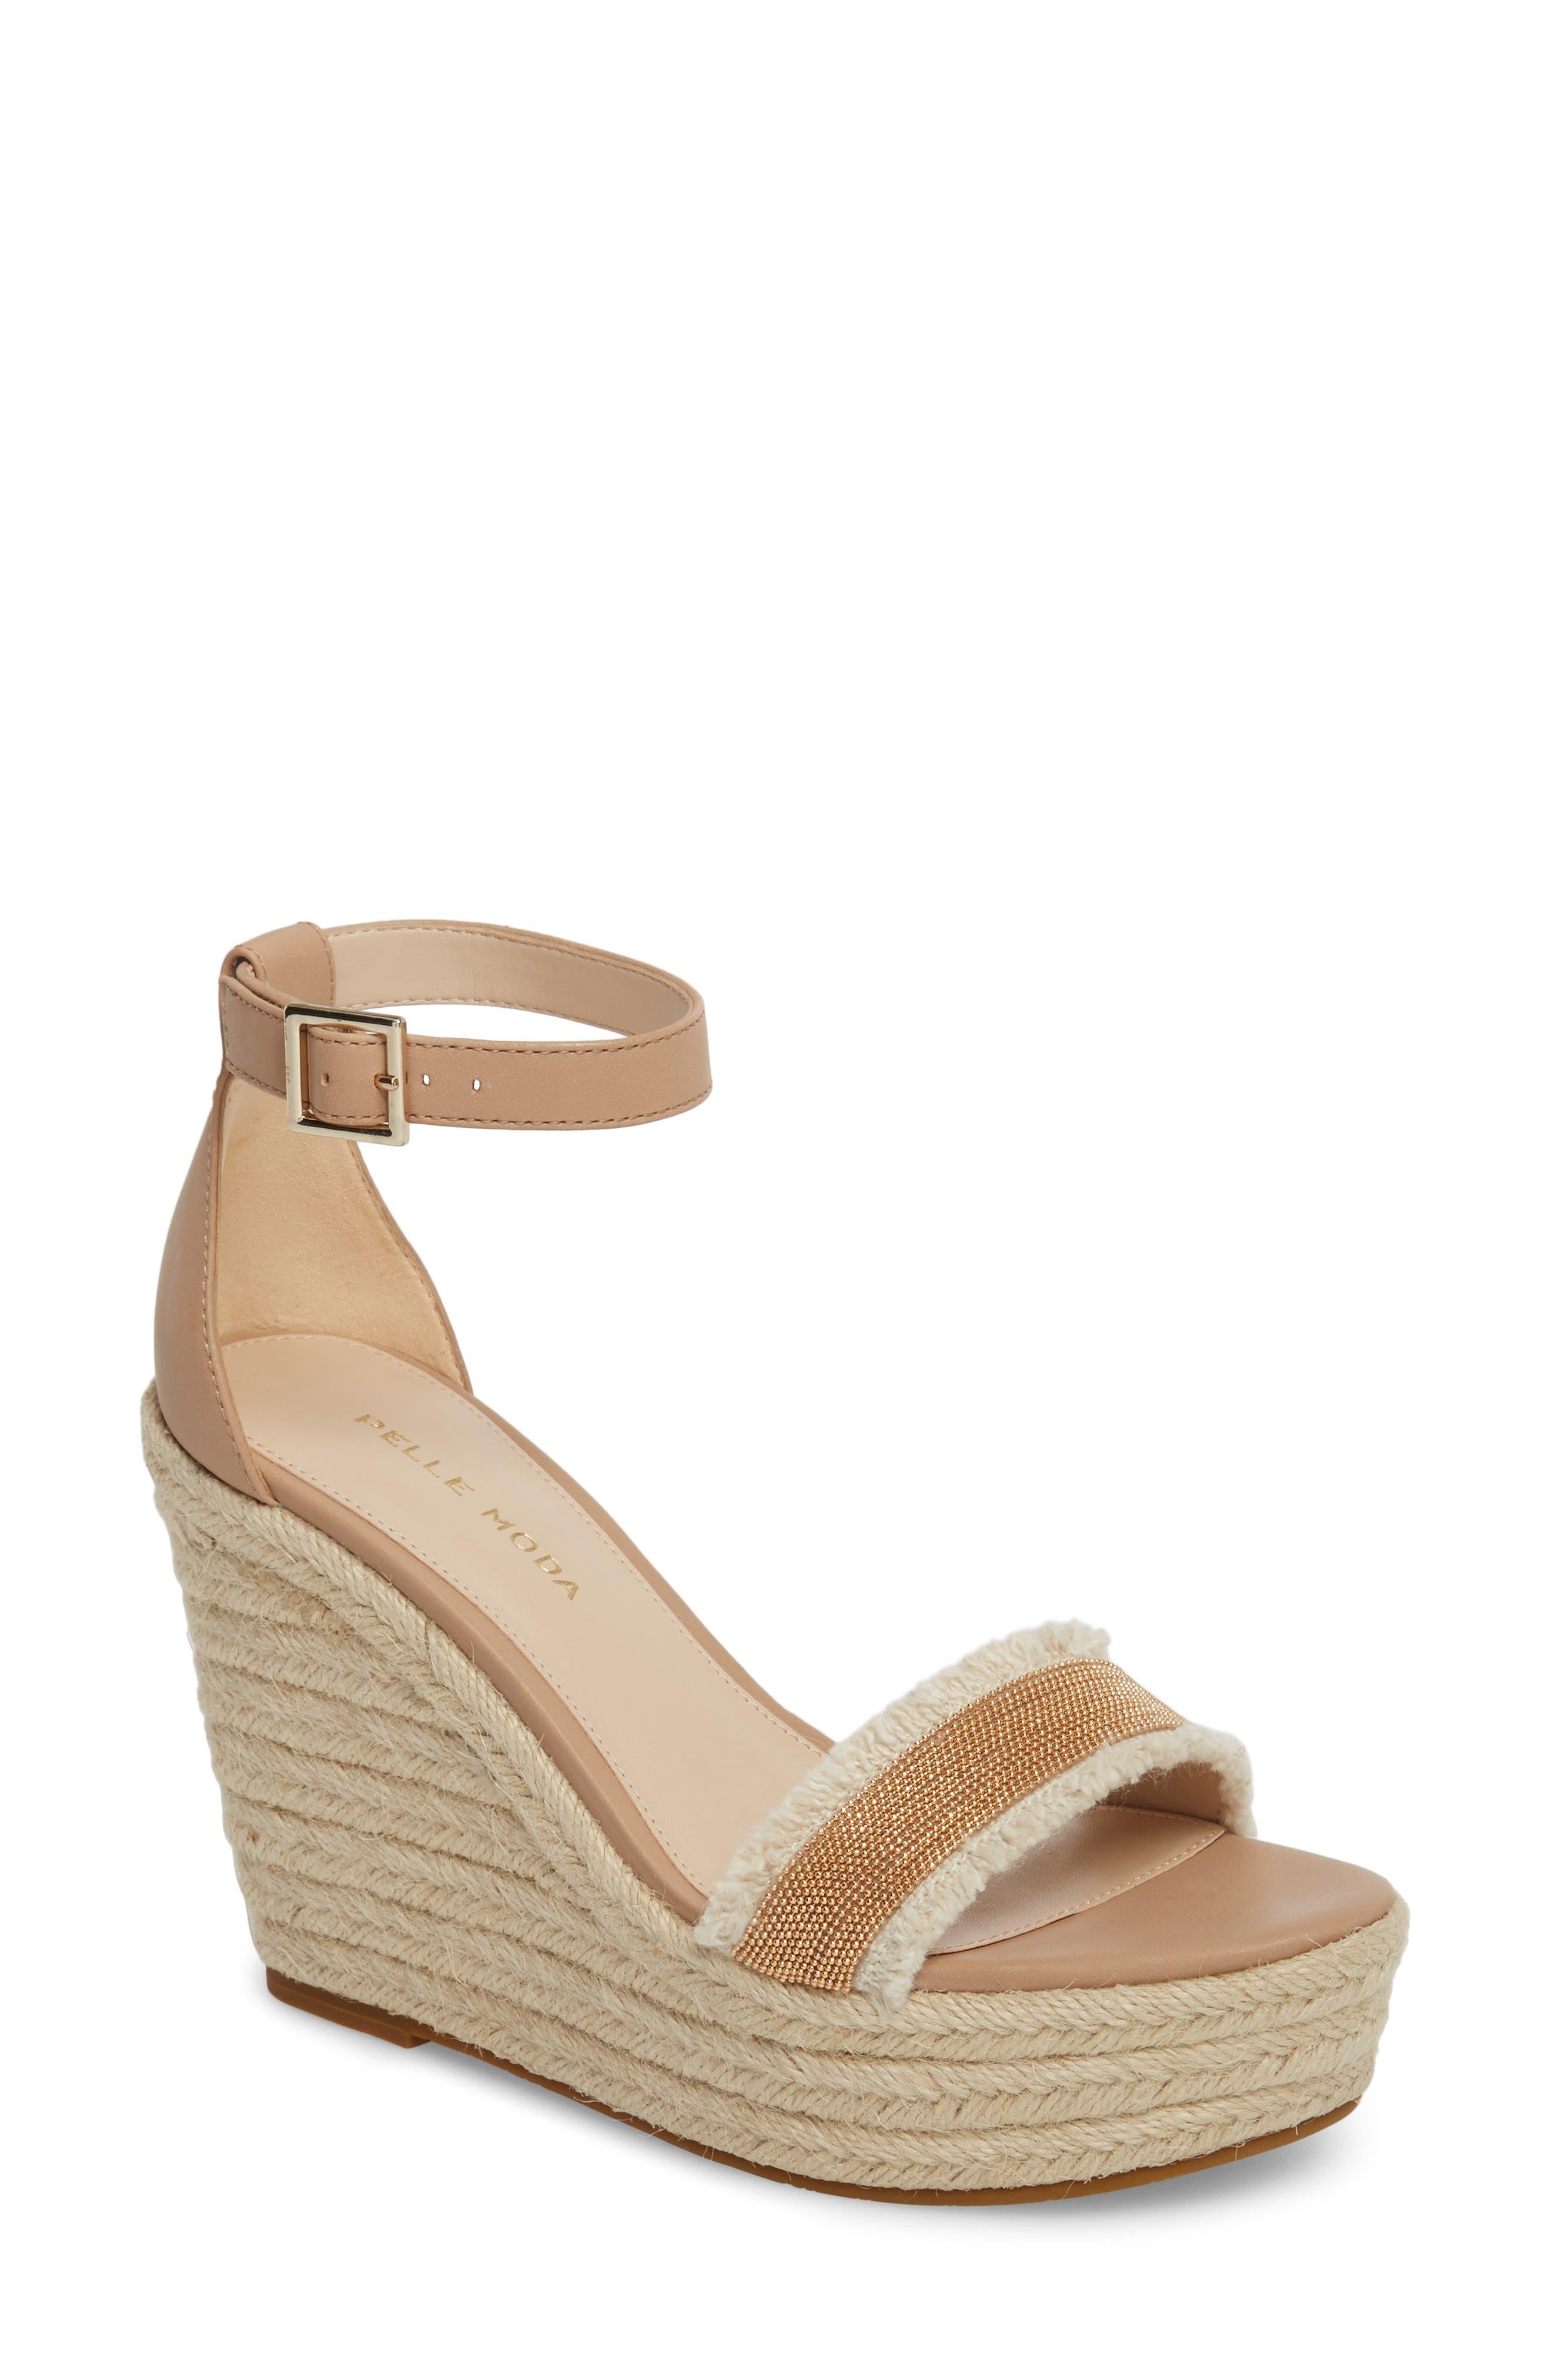 Radley Espadrille Wedge Sandal,                             Main thumbnail 1, color,                             Sand Leather